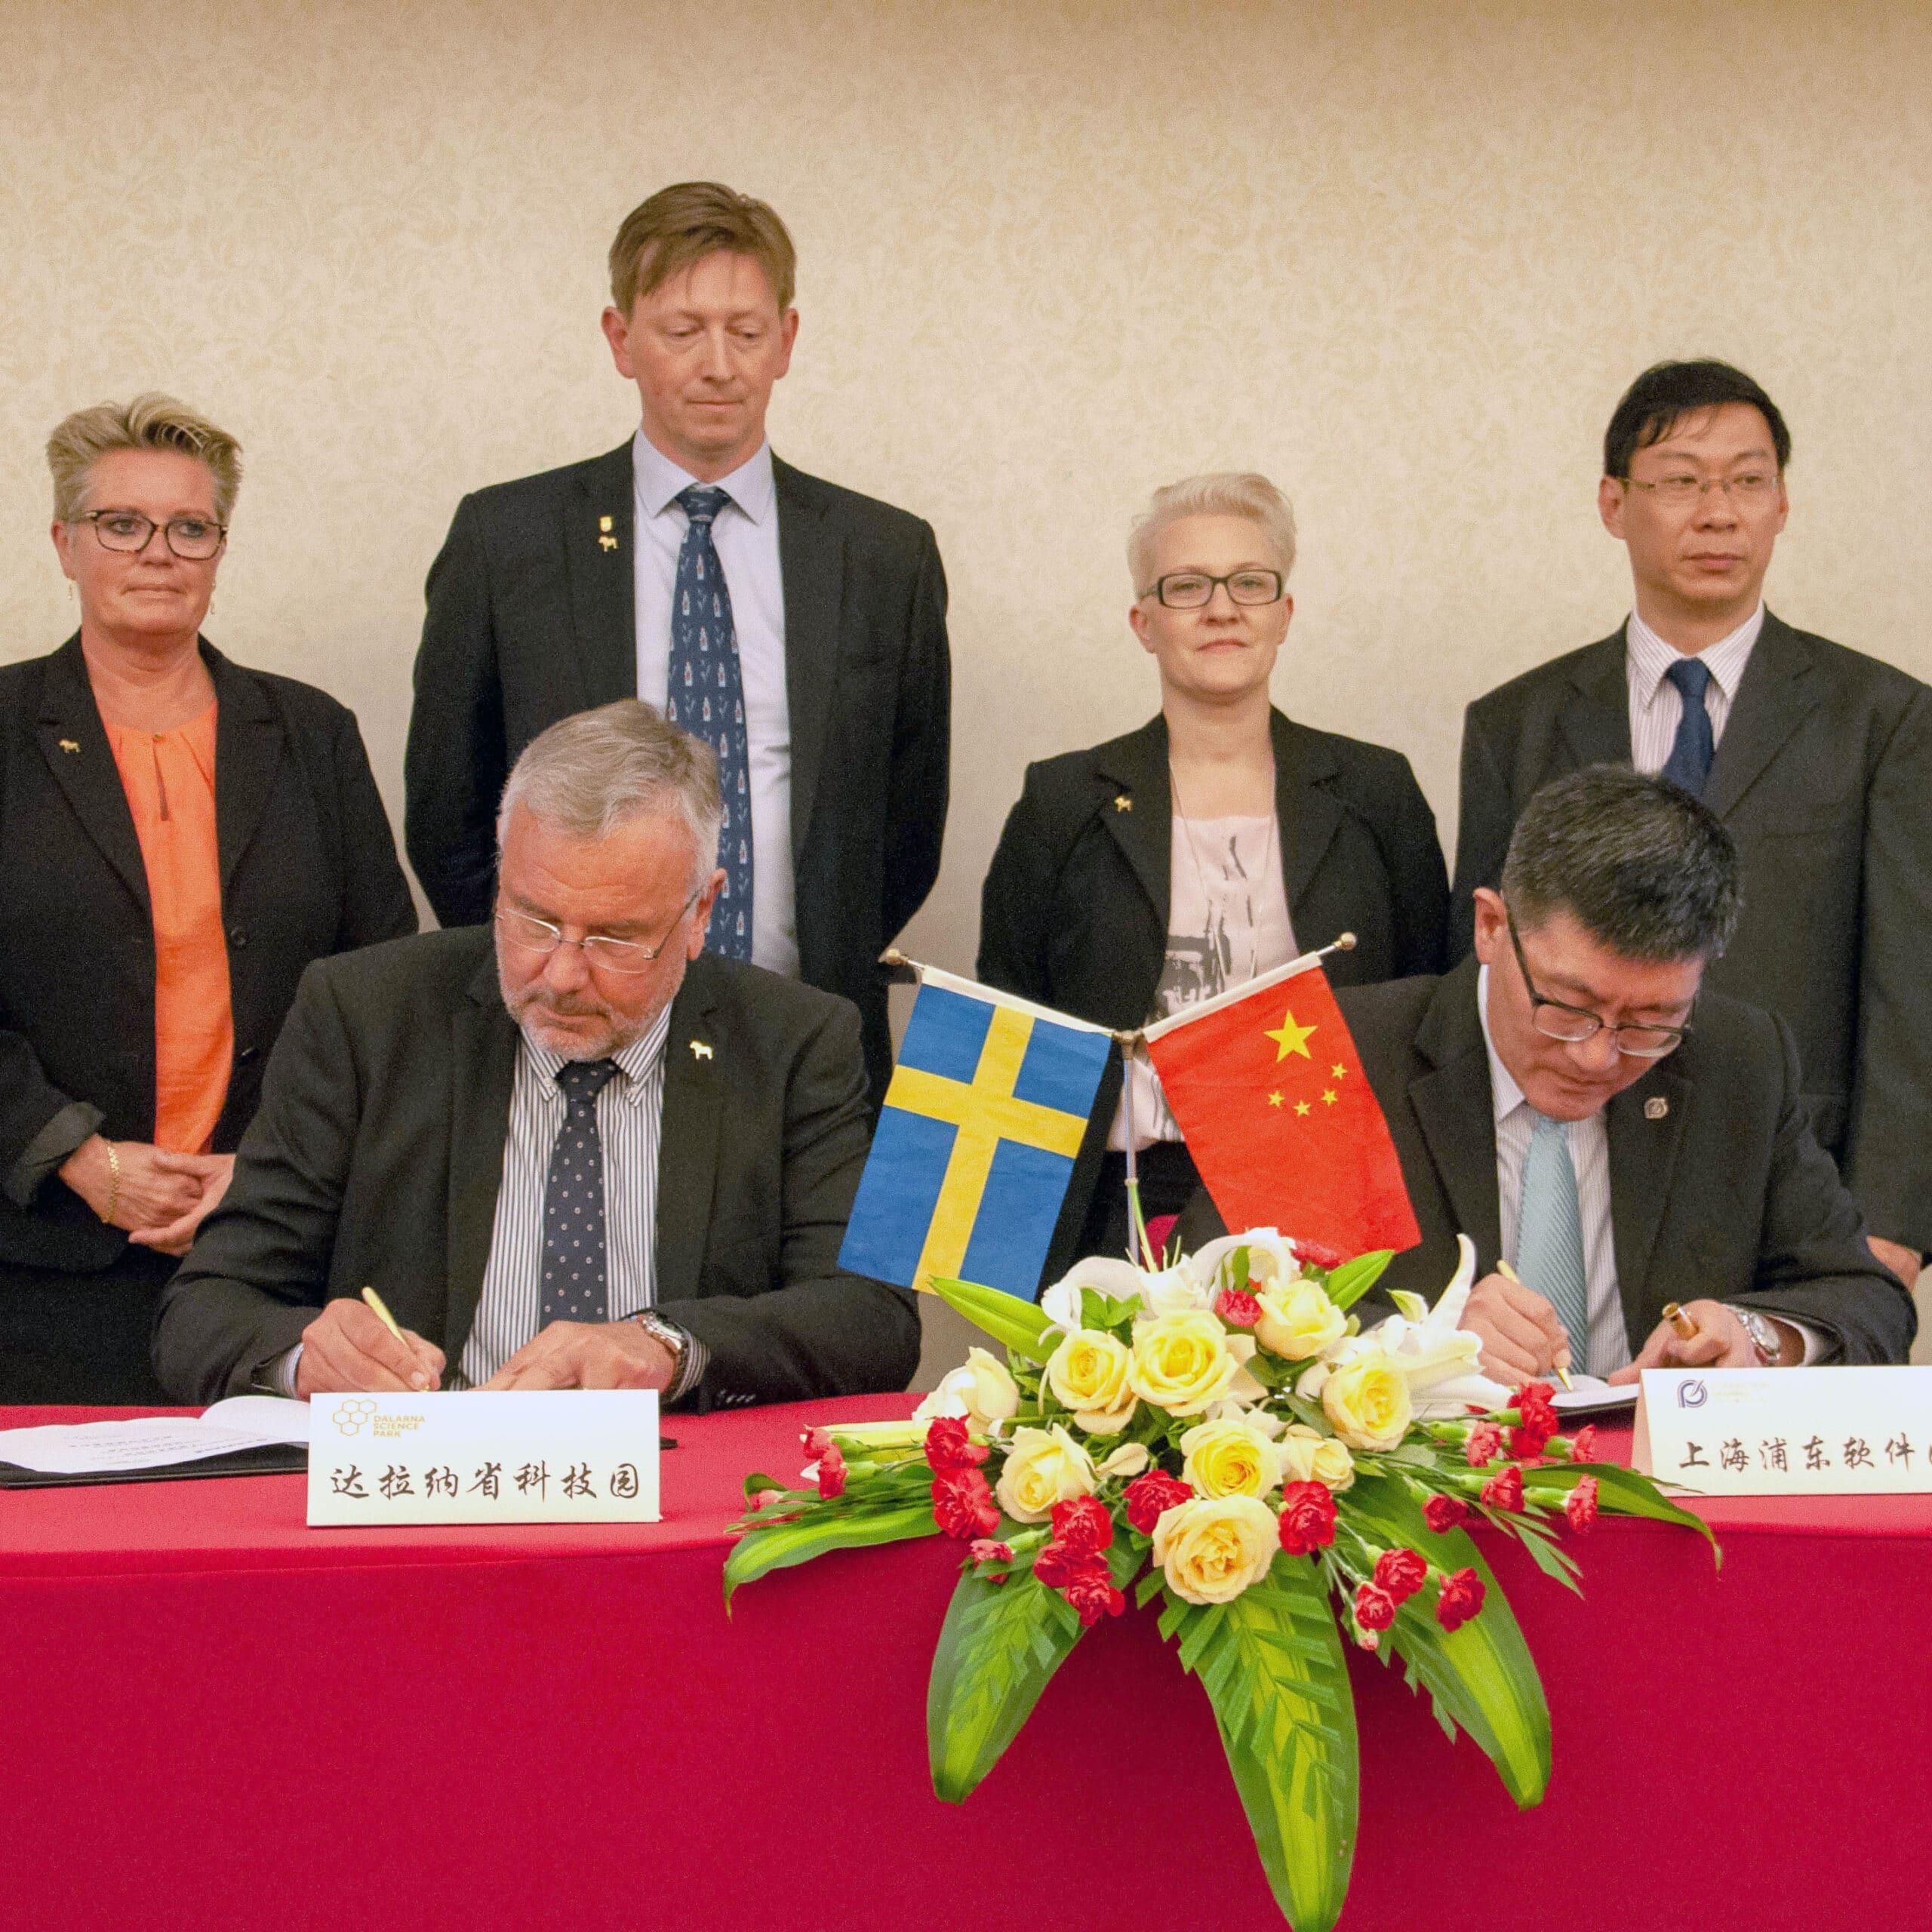 International cooperation between Dalarna Sciecne Park and Shanghai